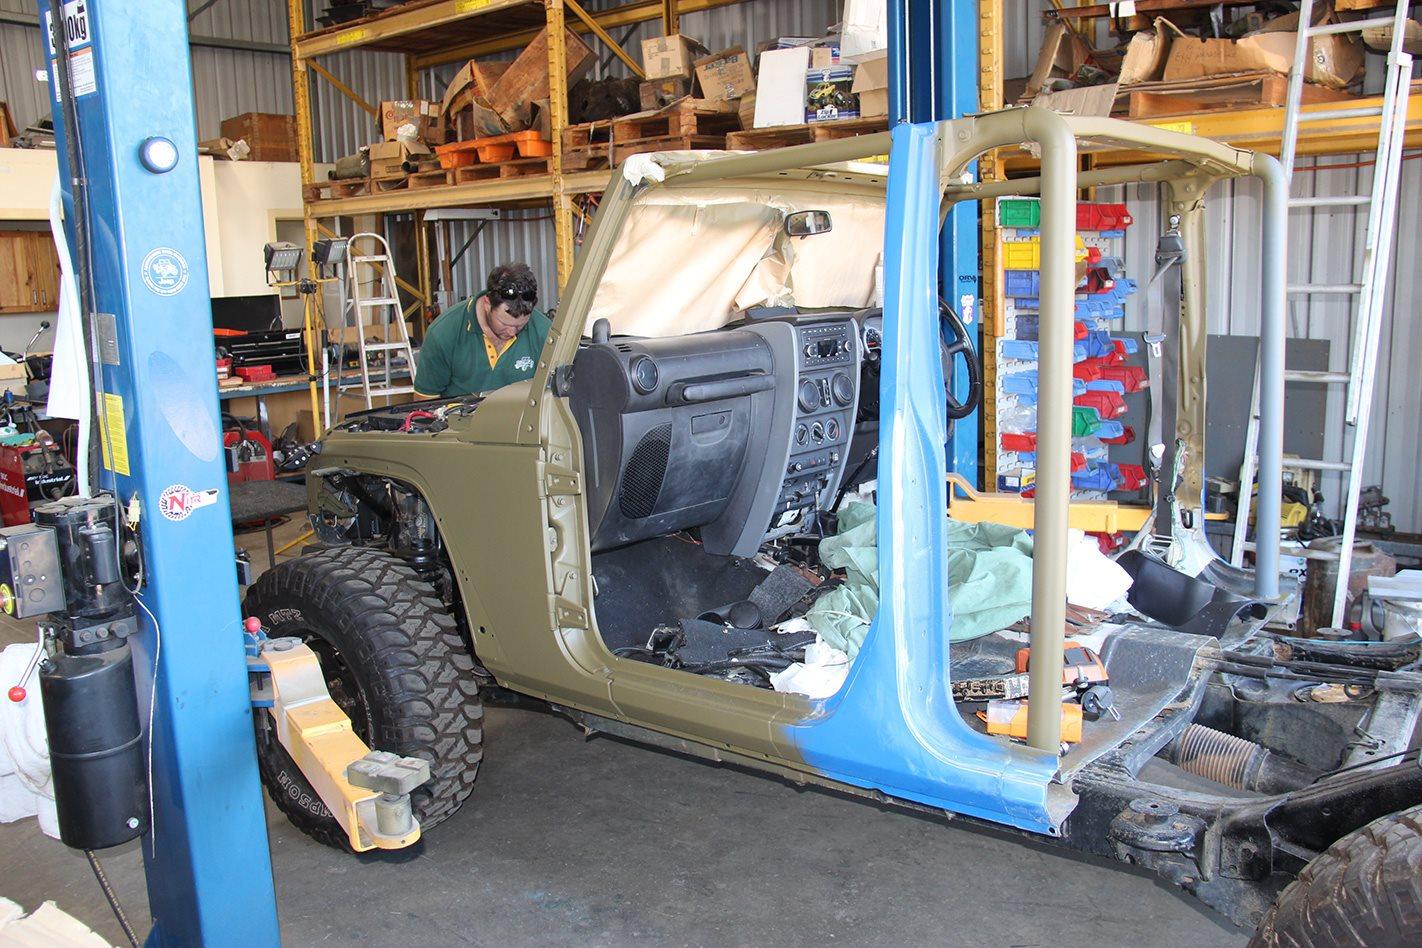 1960 Jeep JK Wrangler 715 replica chassis